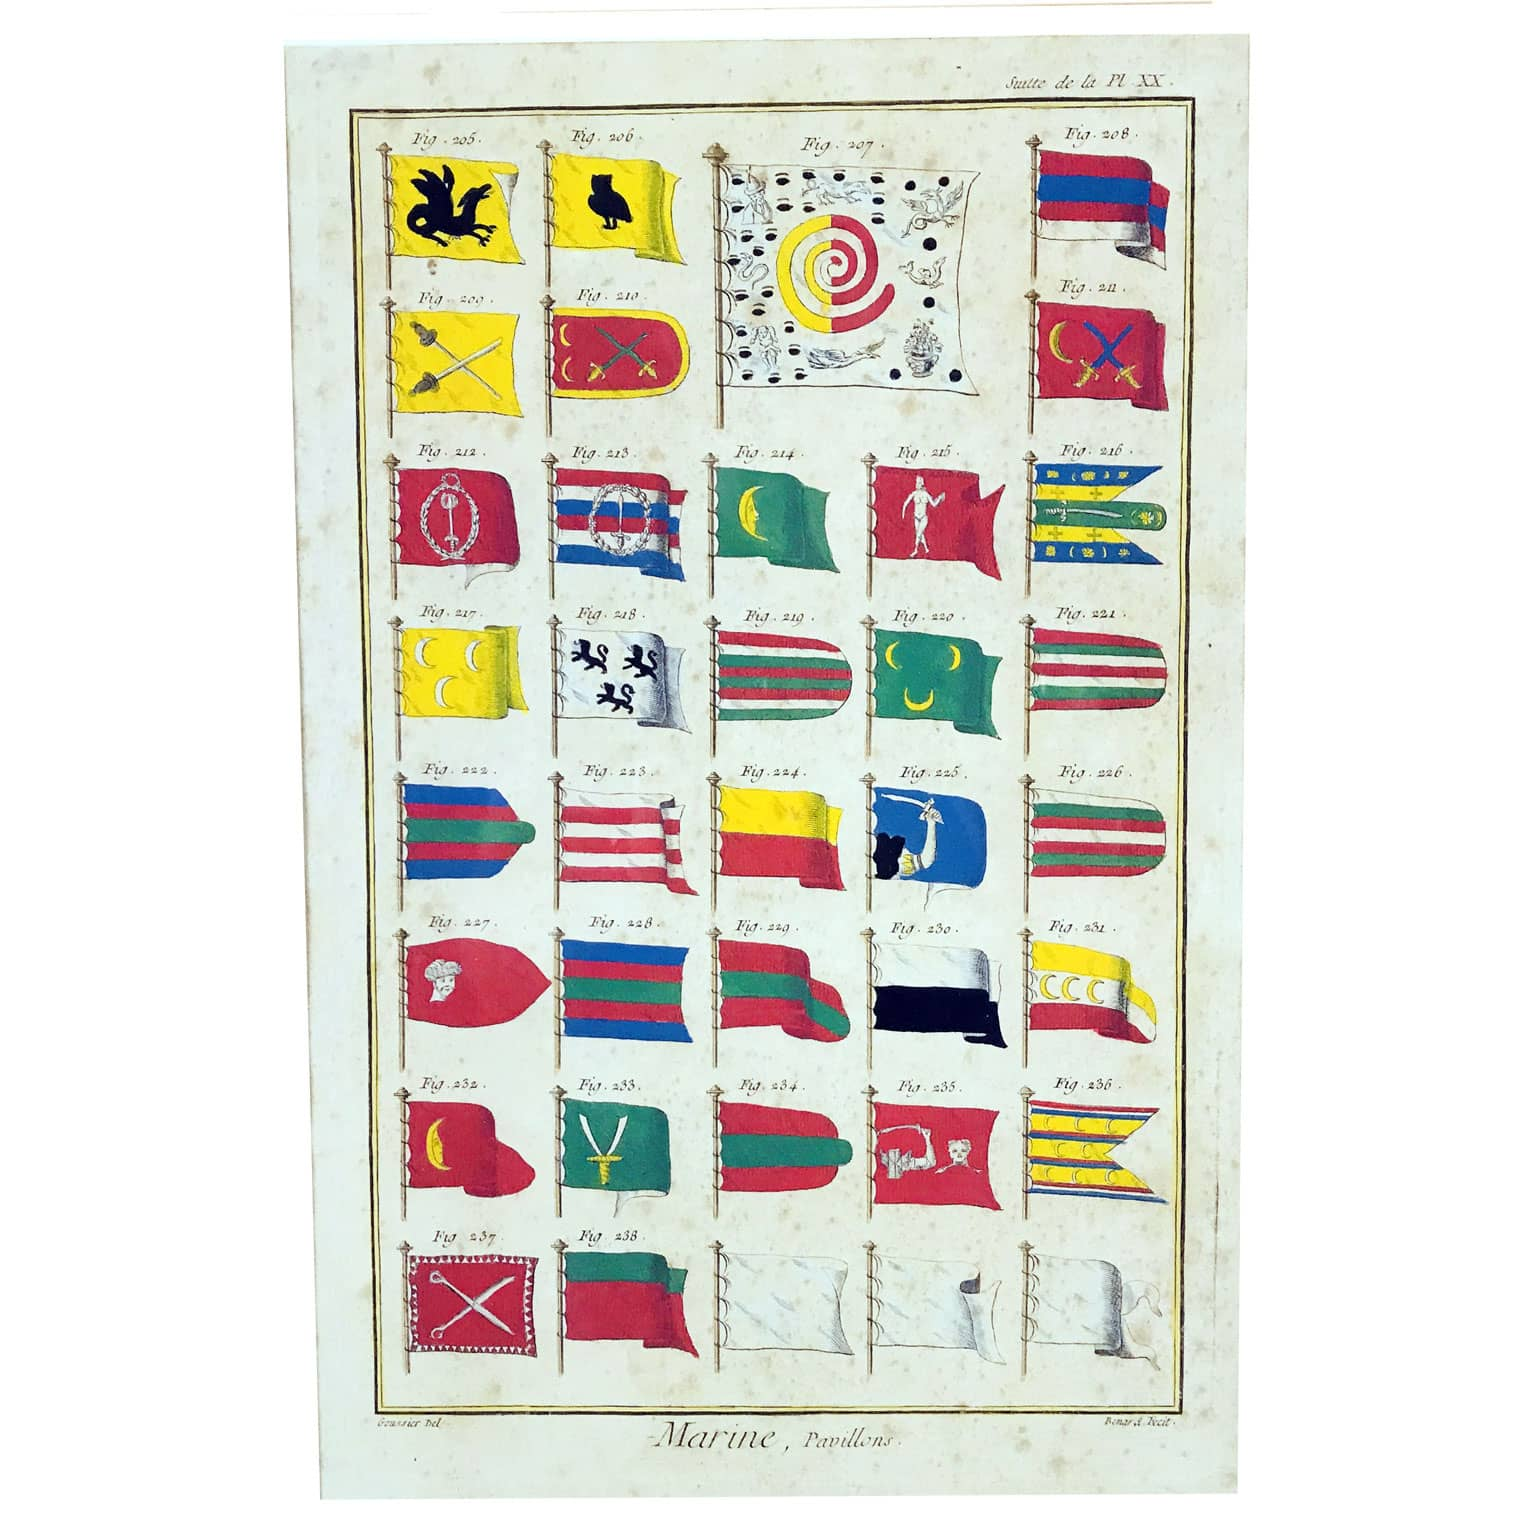 Bandiere Marittime dall'Enciclopedia di Diderot e D'Alembert, 1770 circa